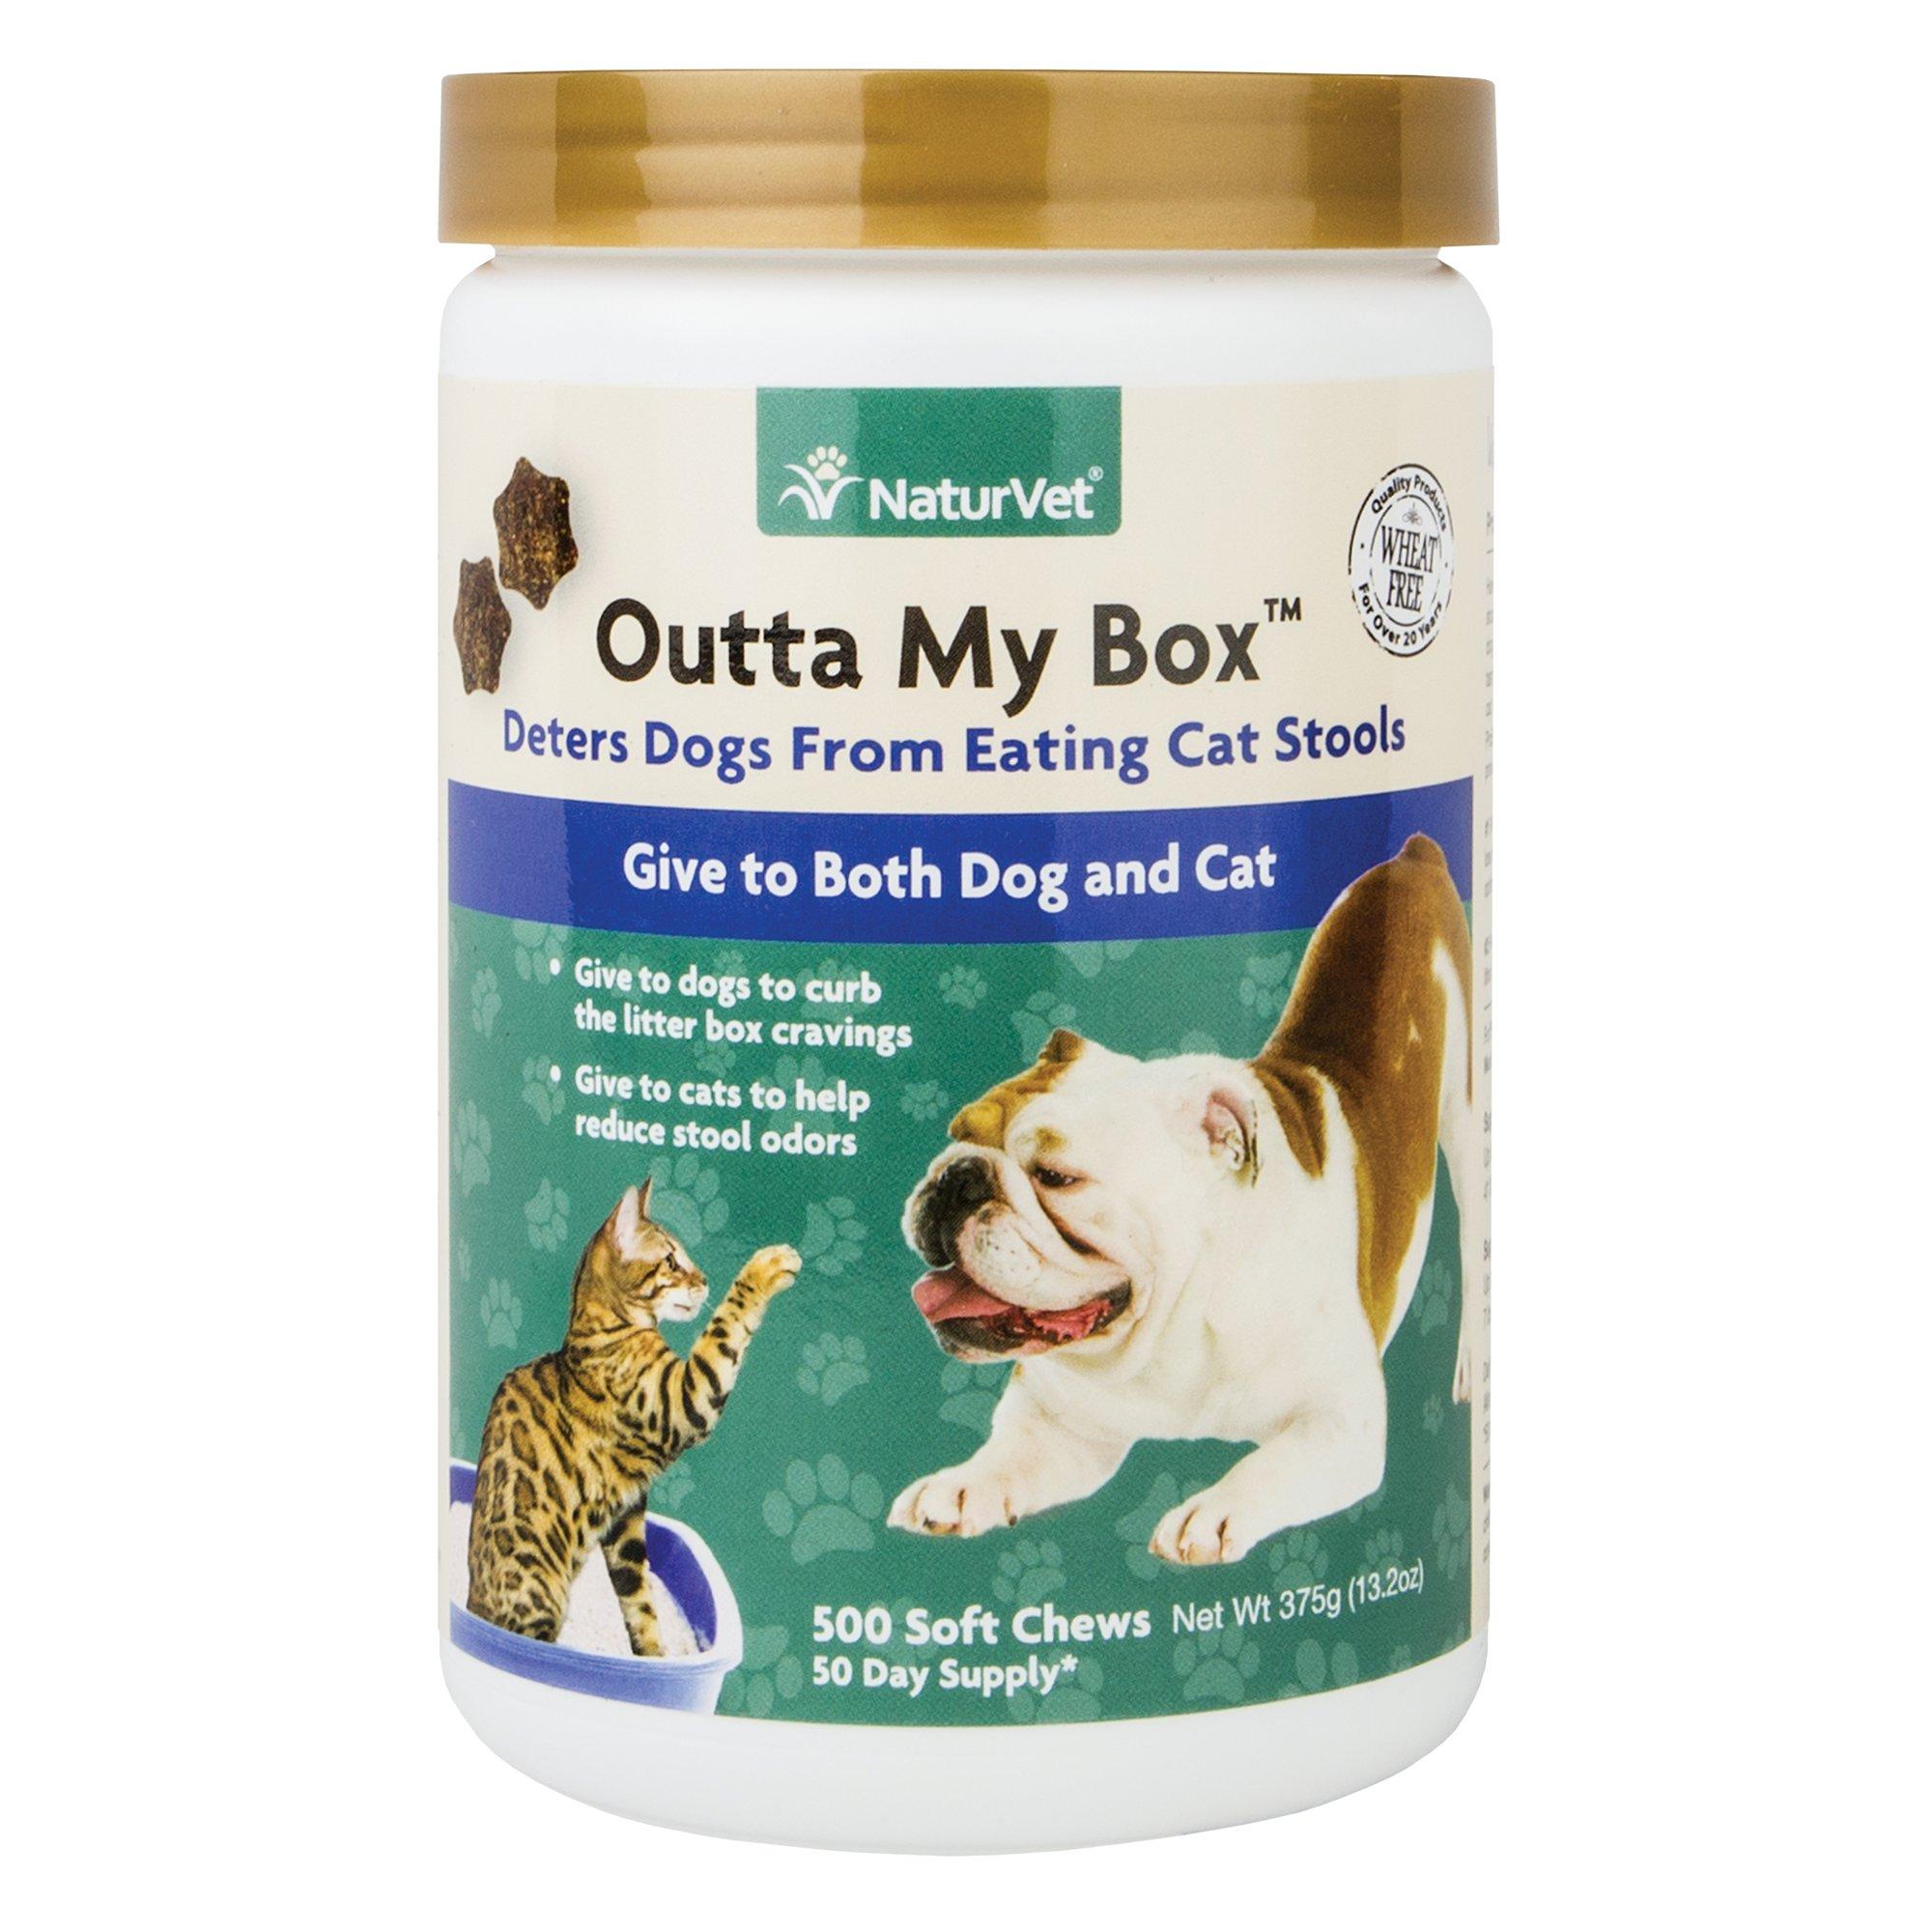 Naturvet Outta My Box Petco